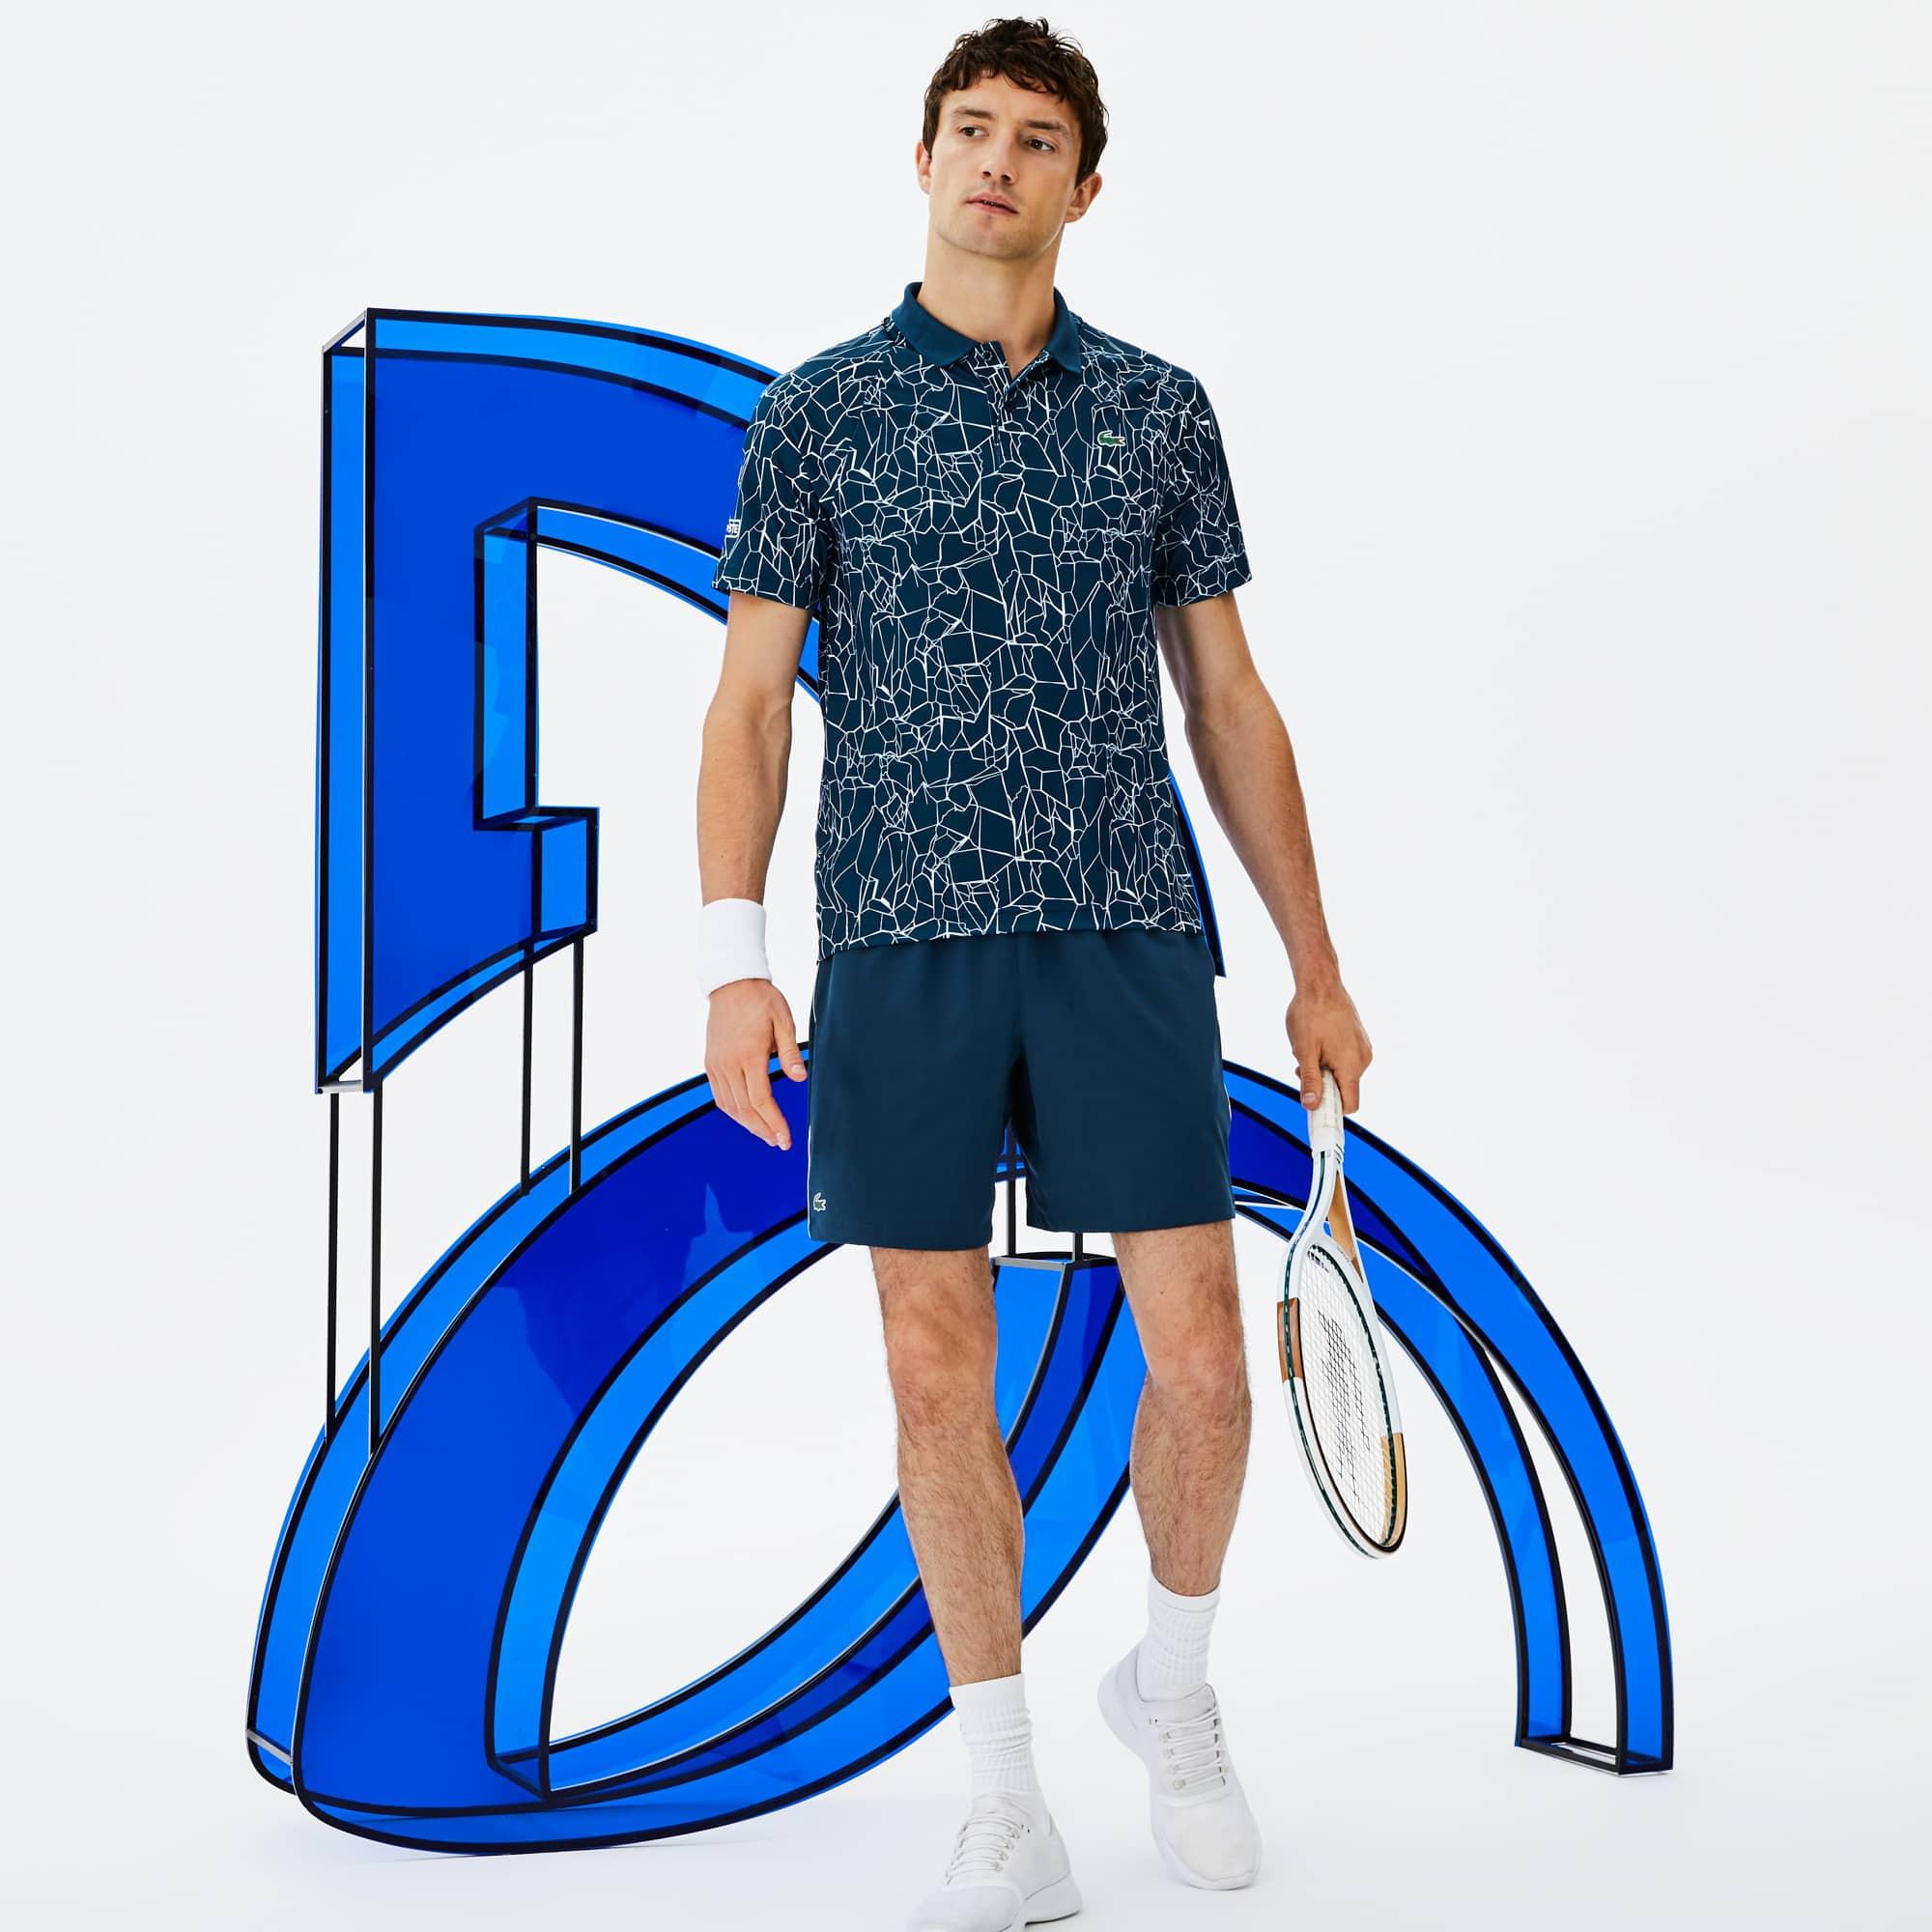 Pantalón Técnico Lacoste SPORT Collection Novak Djokovic Support With Style